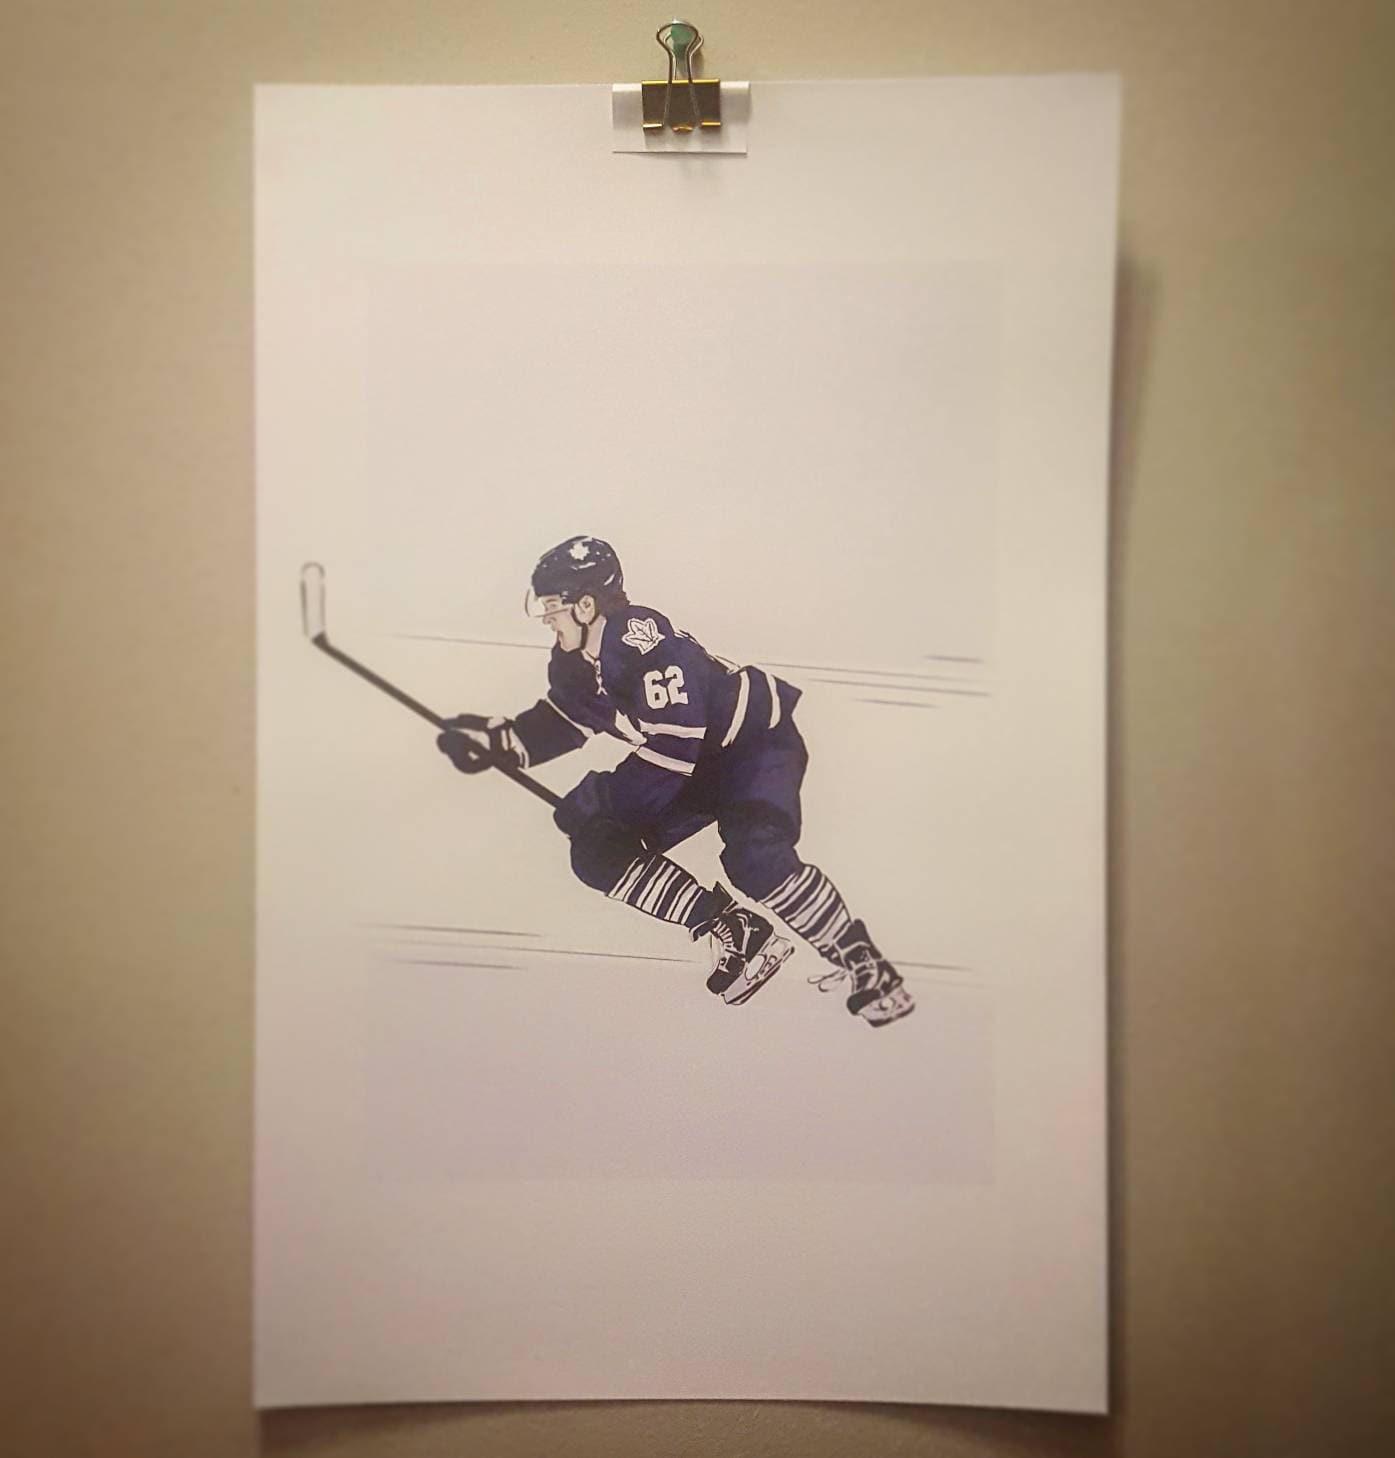 William Nylander Toronto Maple Leafs High Quality Print Etsy